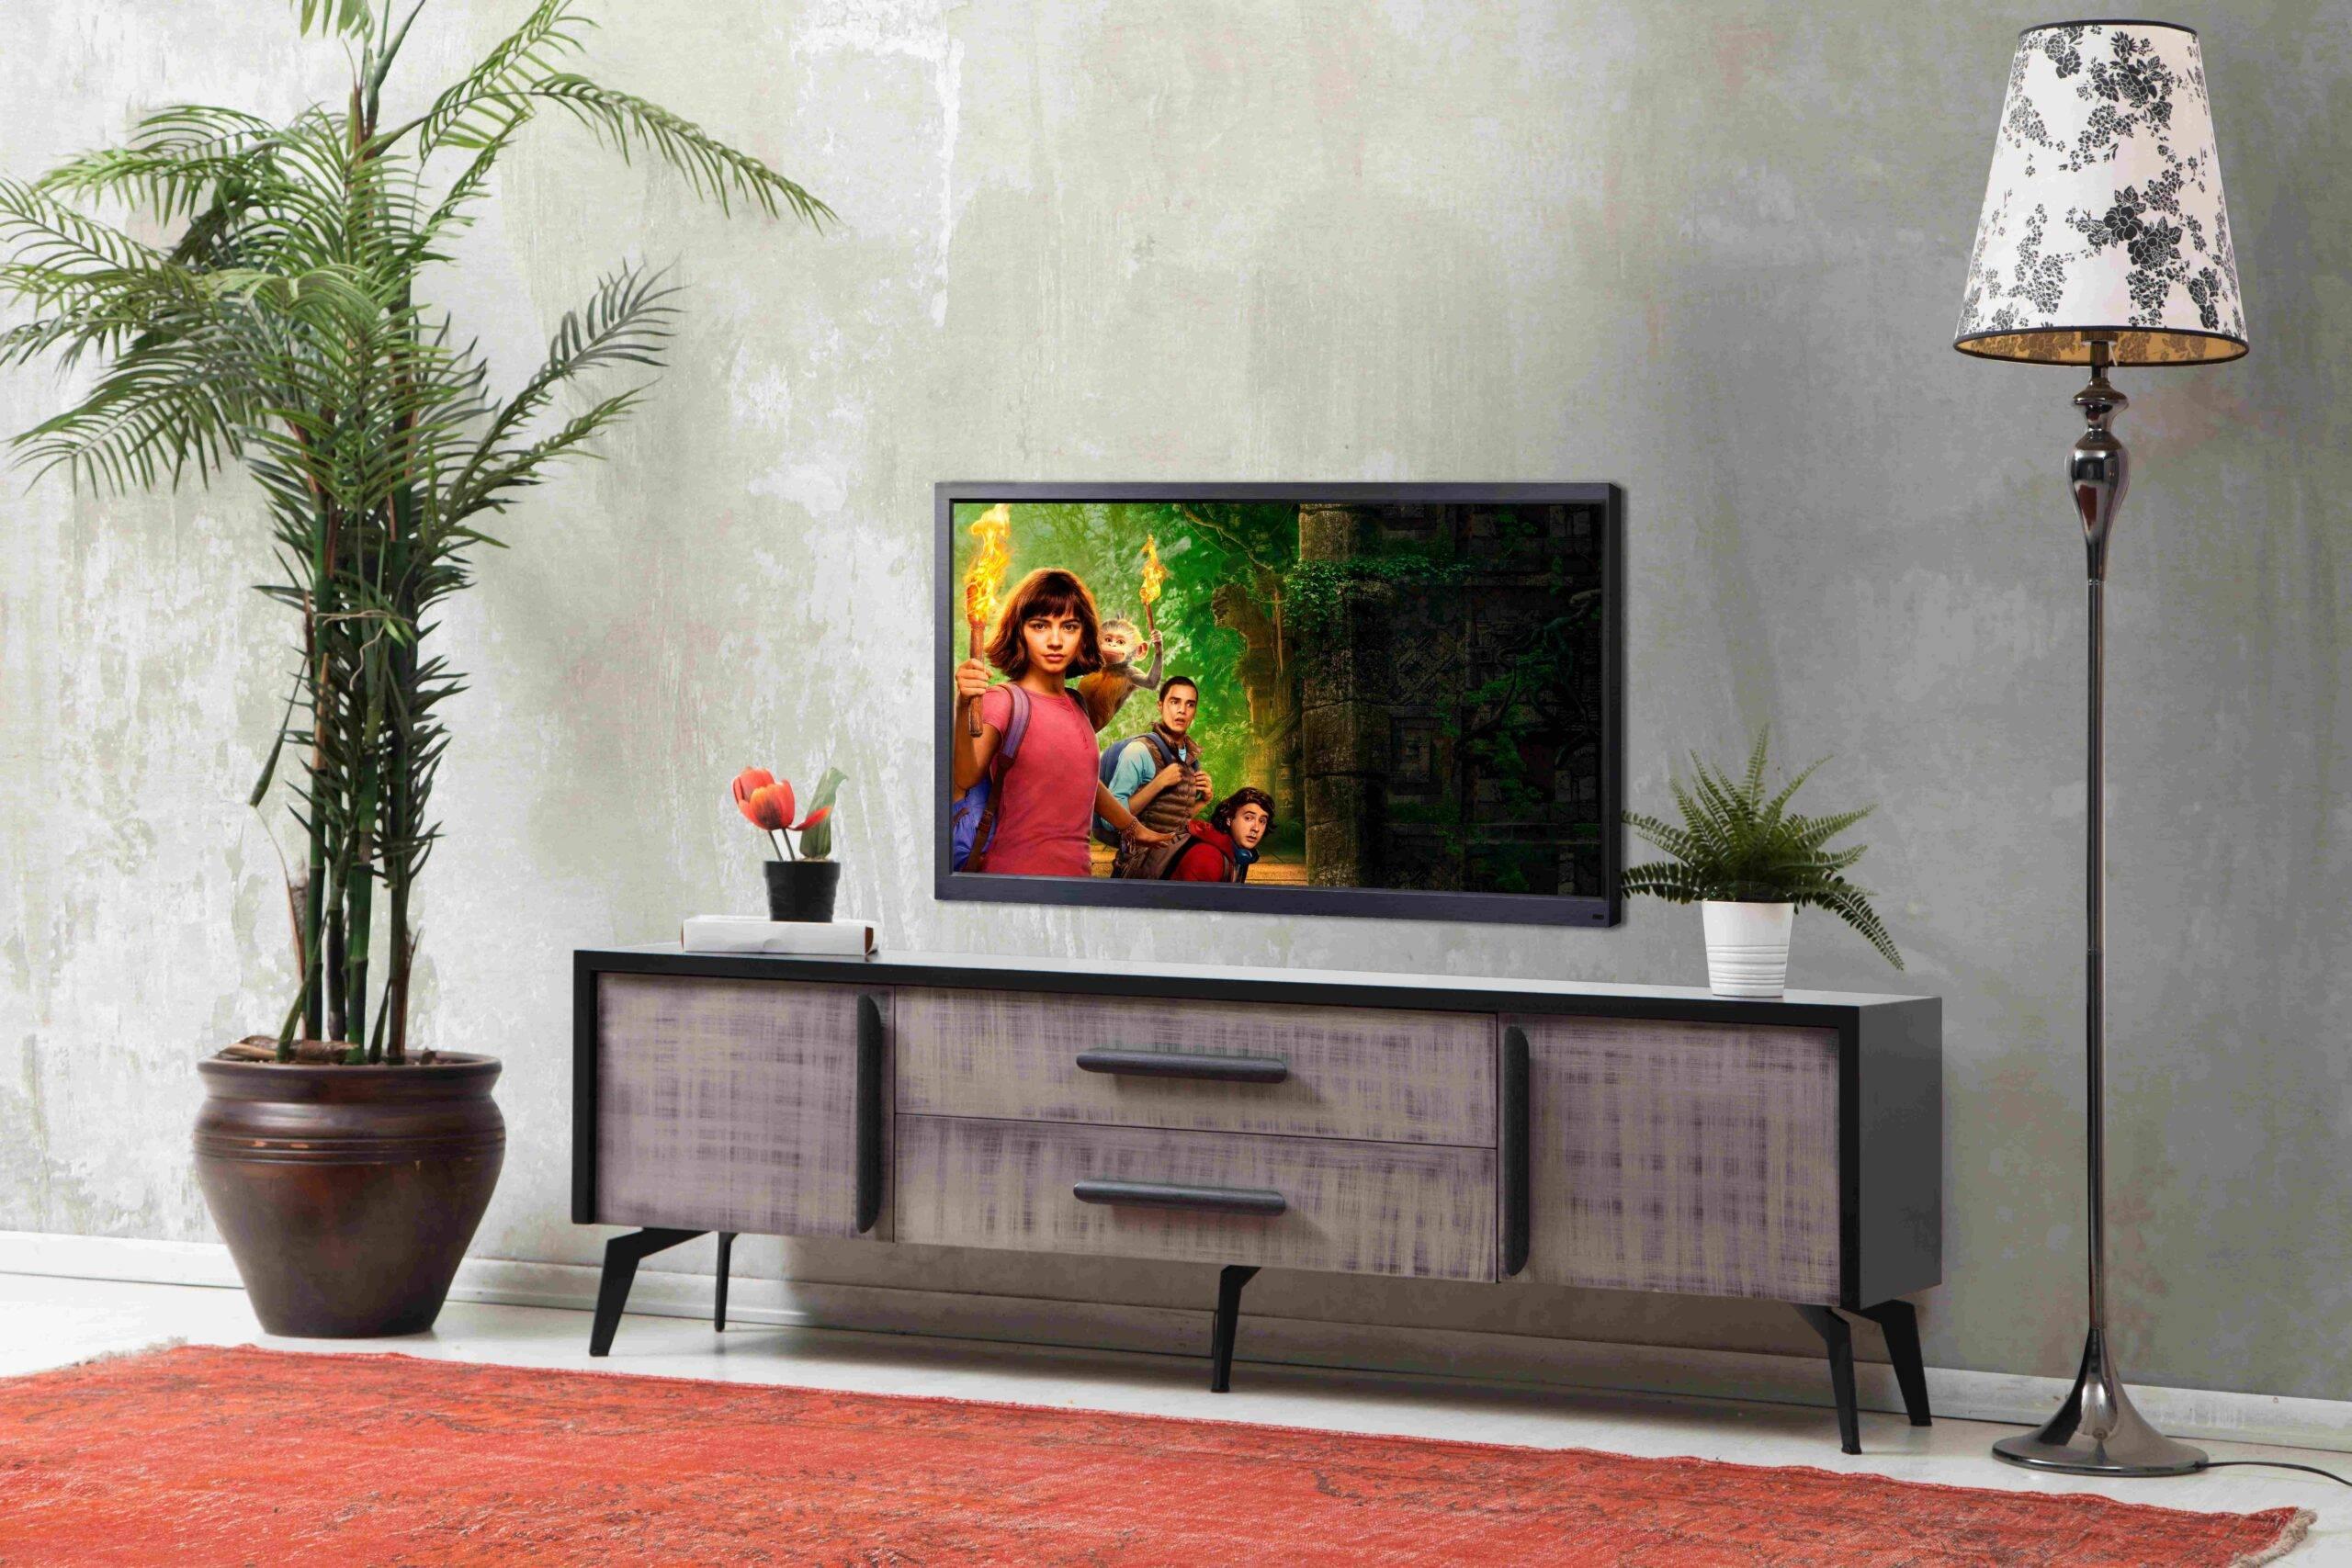 burberry tv sehpası